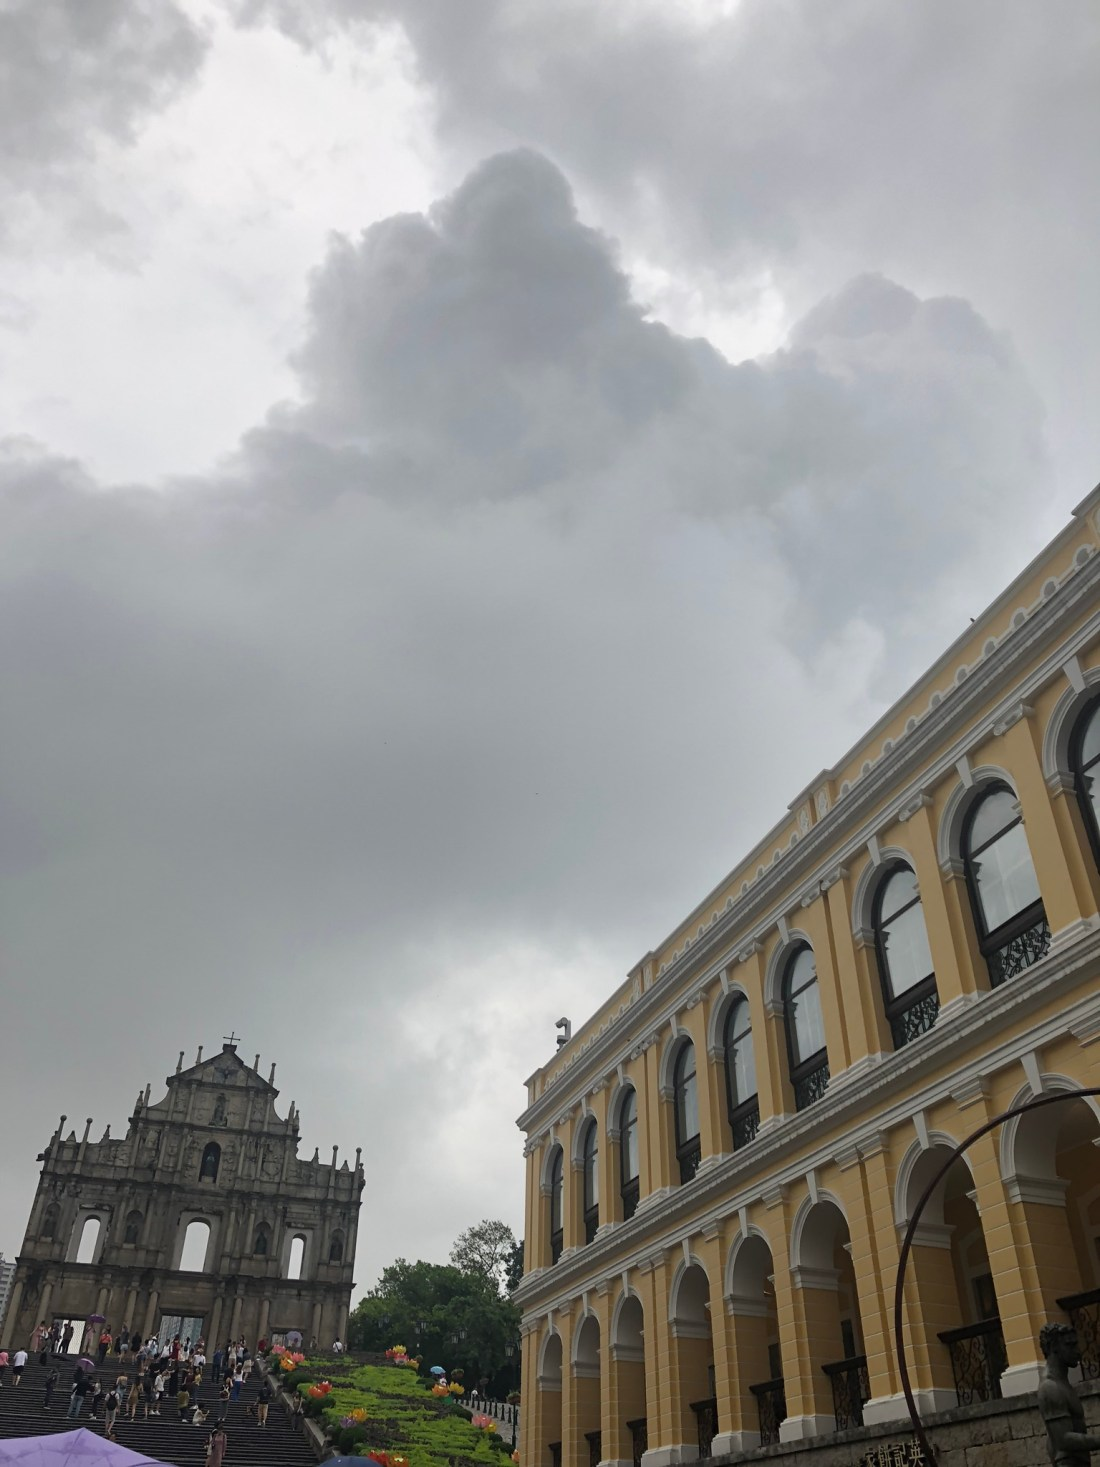 St Pauls Ruins in Macau